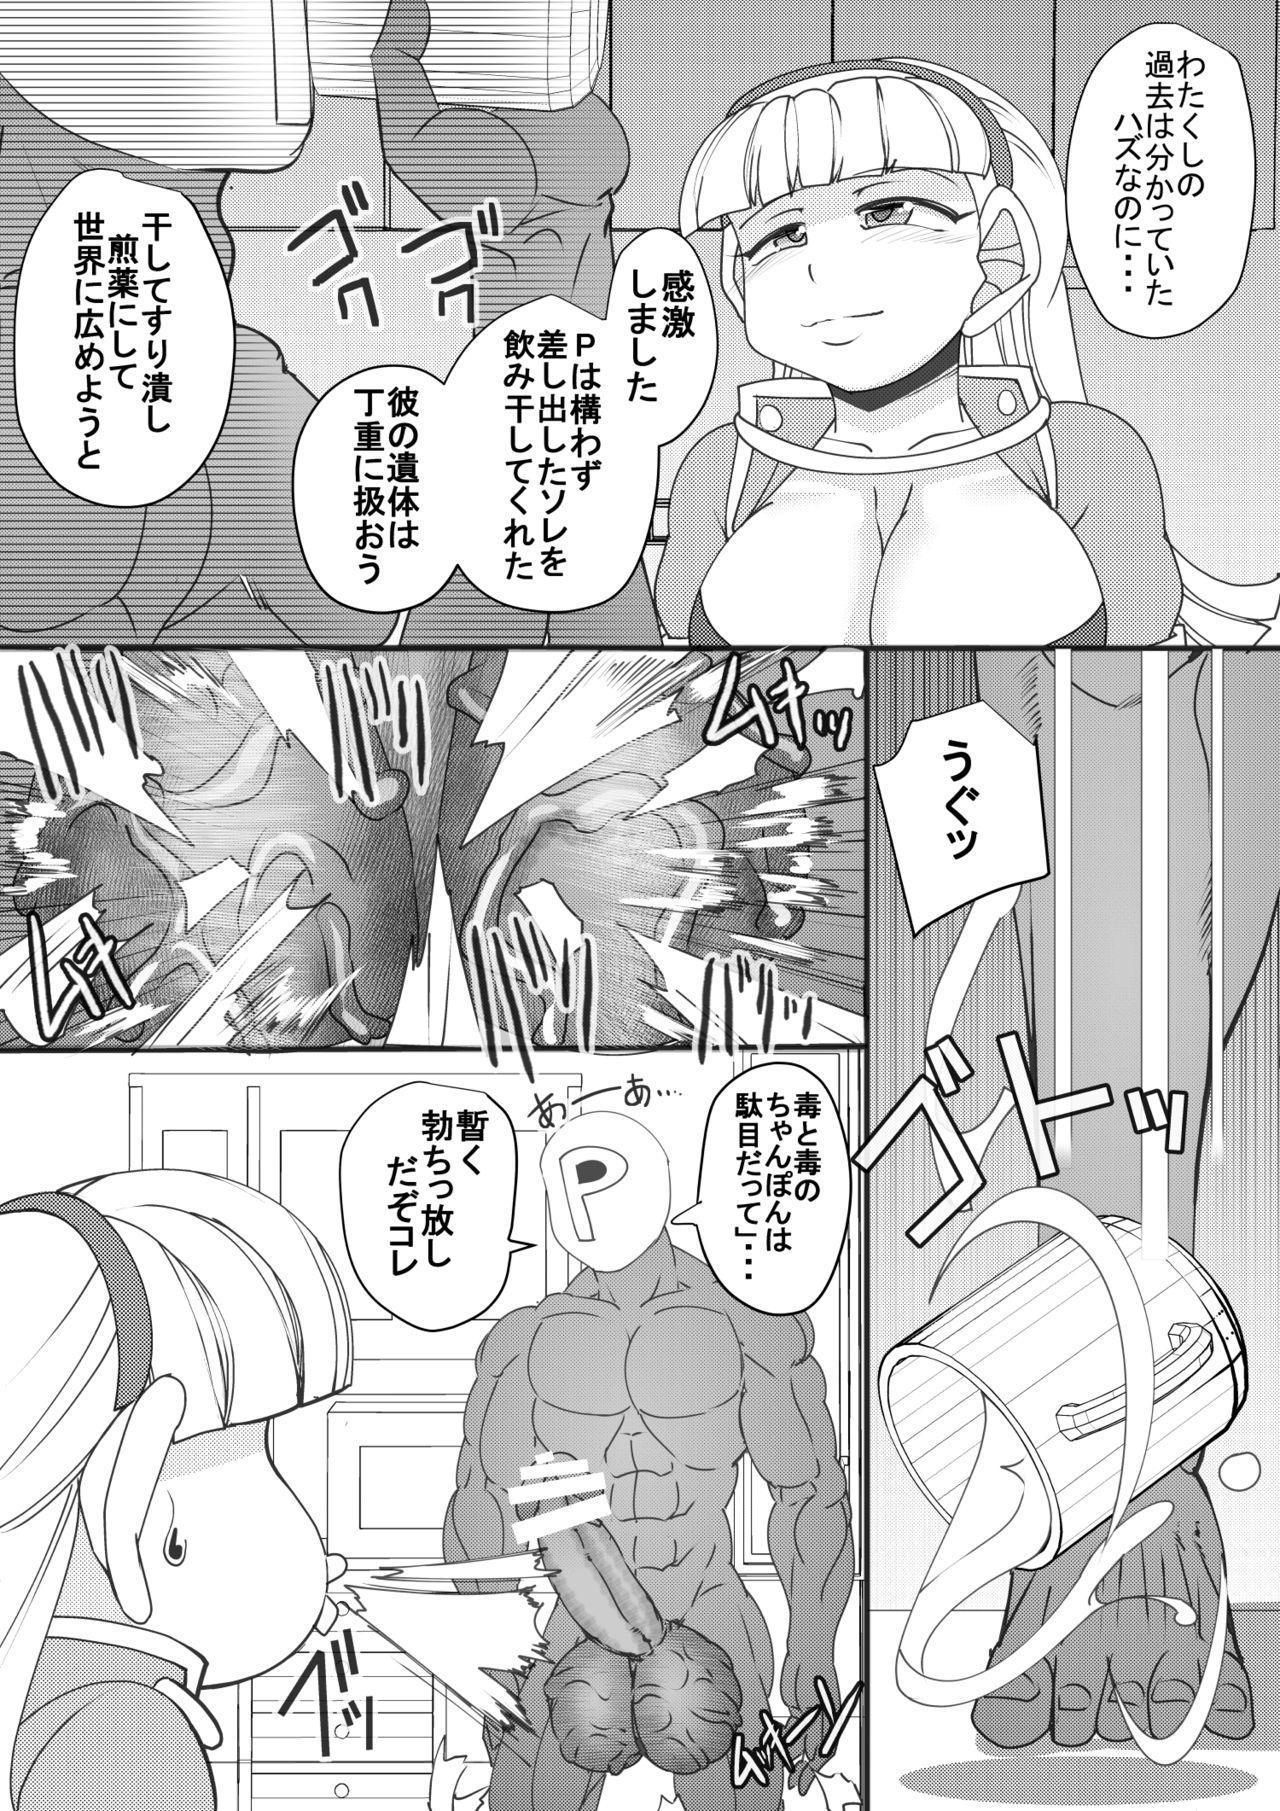 Haramachi 5 6